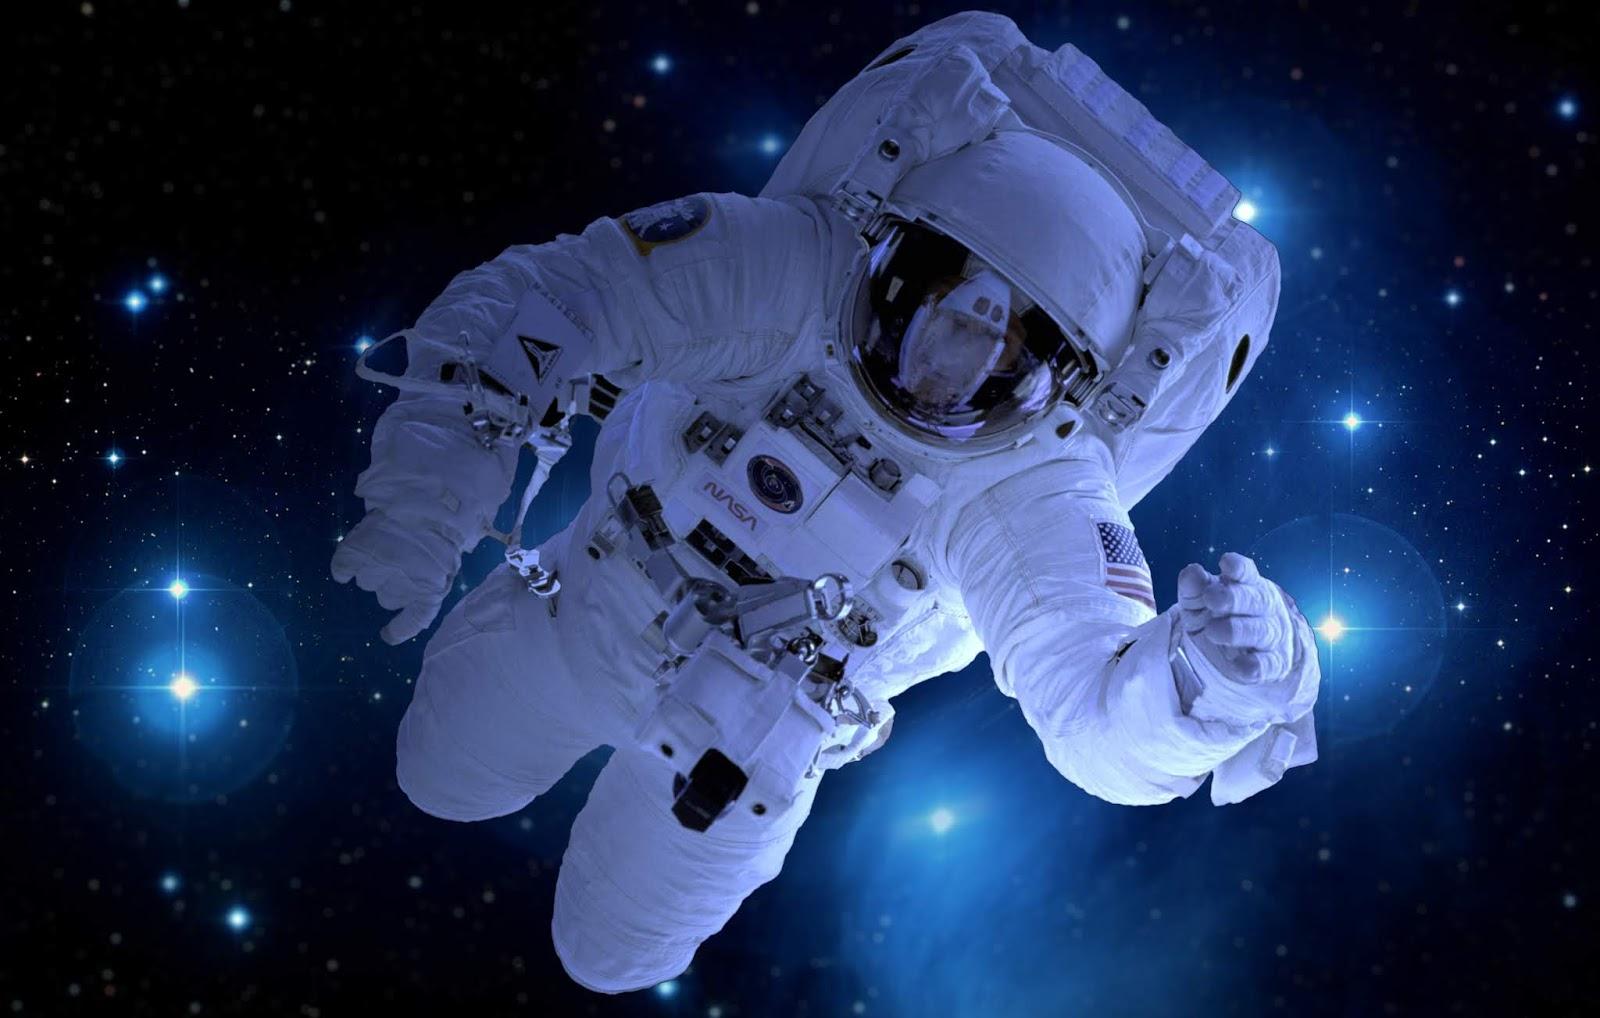 Astronaut, Deep Space, Stars, Blue, NASA, 4K, Space